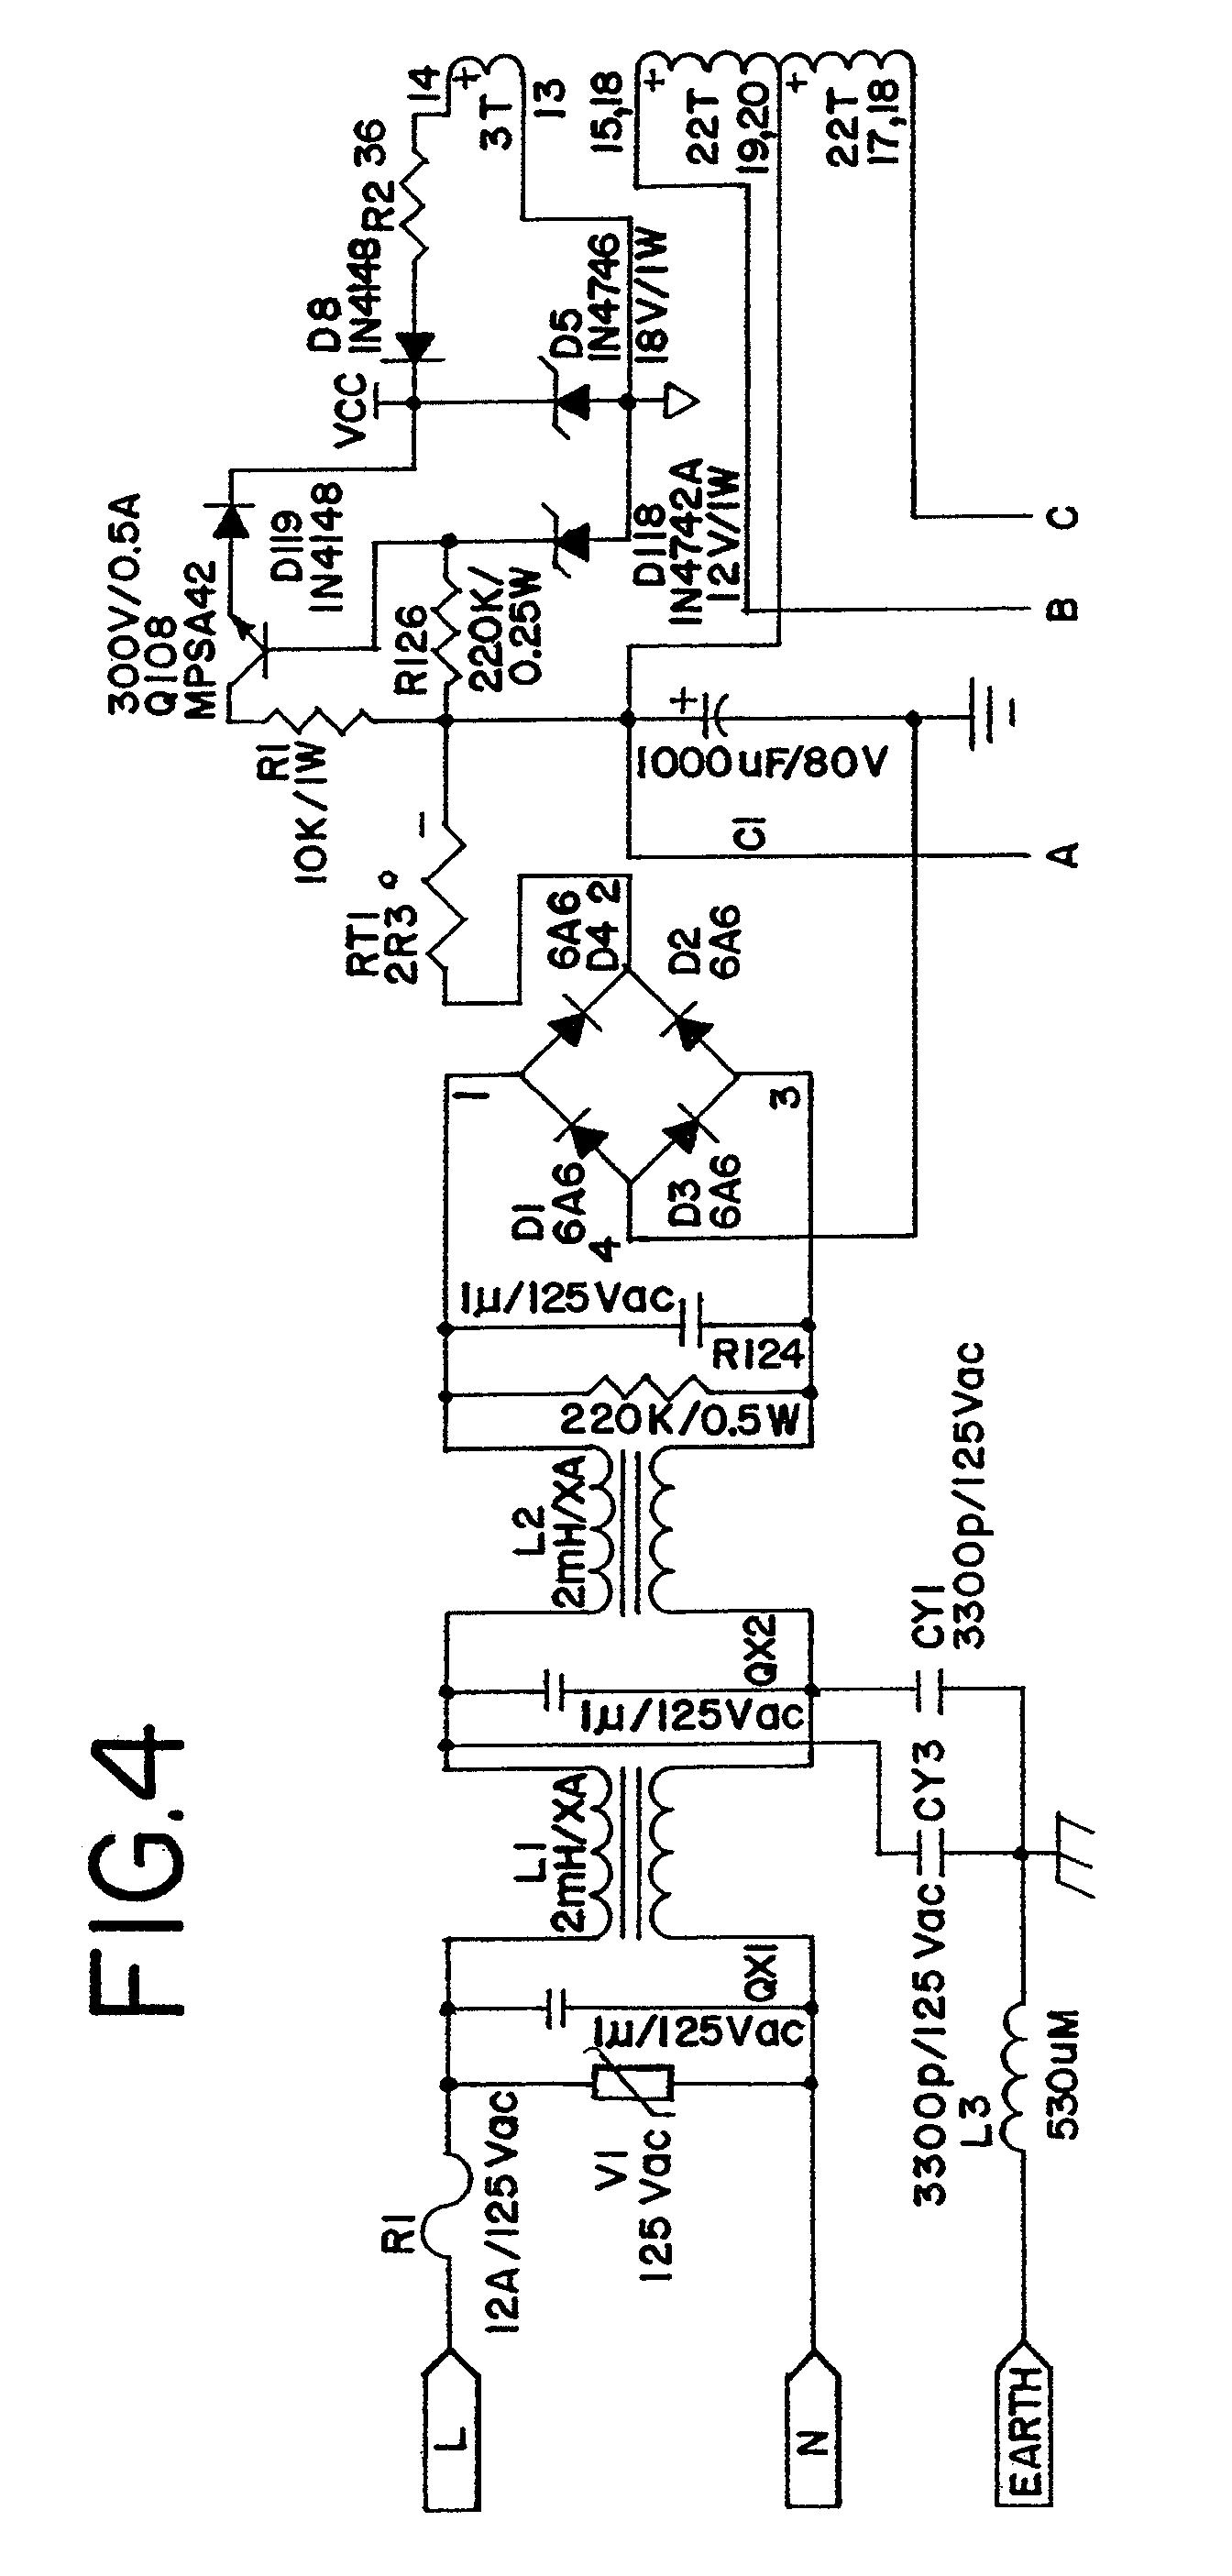 4 Wire Paper Shredder Motor Wiring Diagram 208 Volt Motor